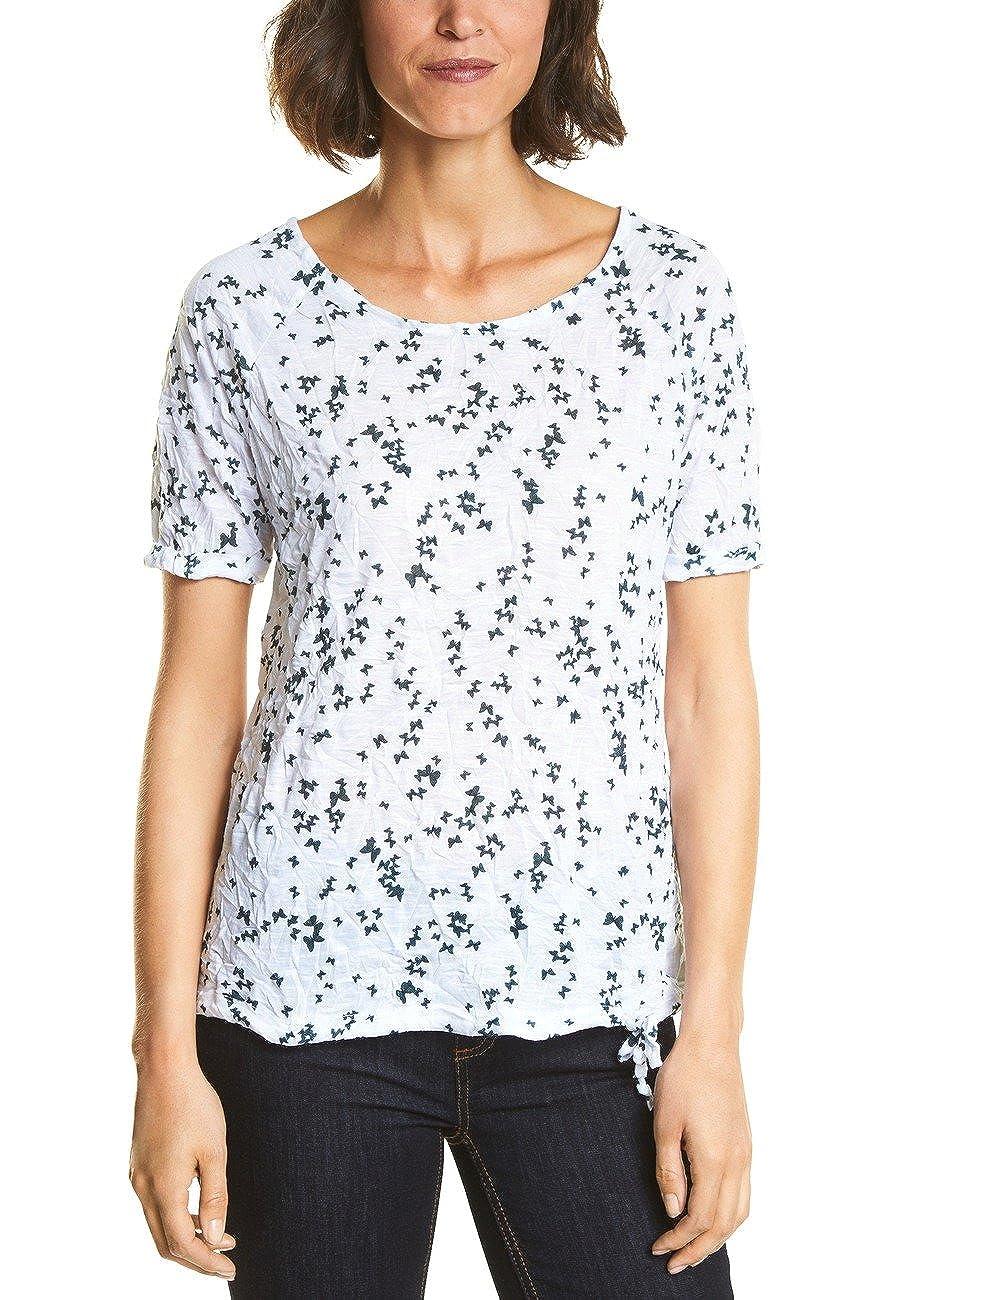 Street One Damen T Shirt Mehrfarbig White 30000 zSZjim4F gut